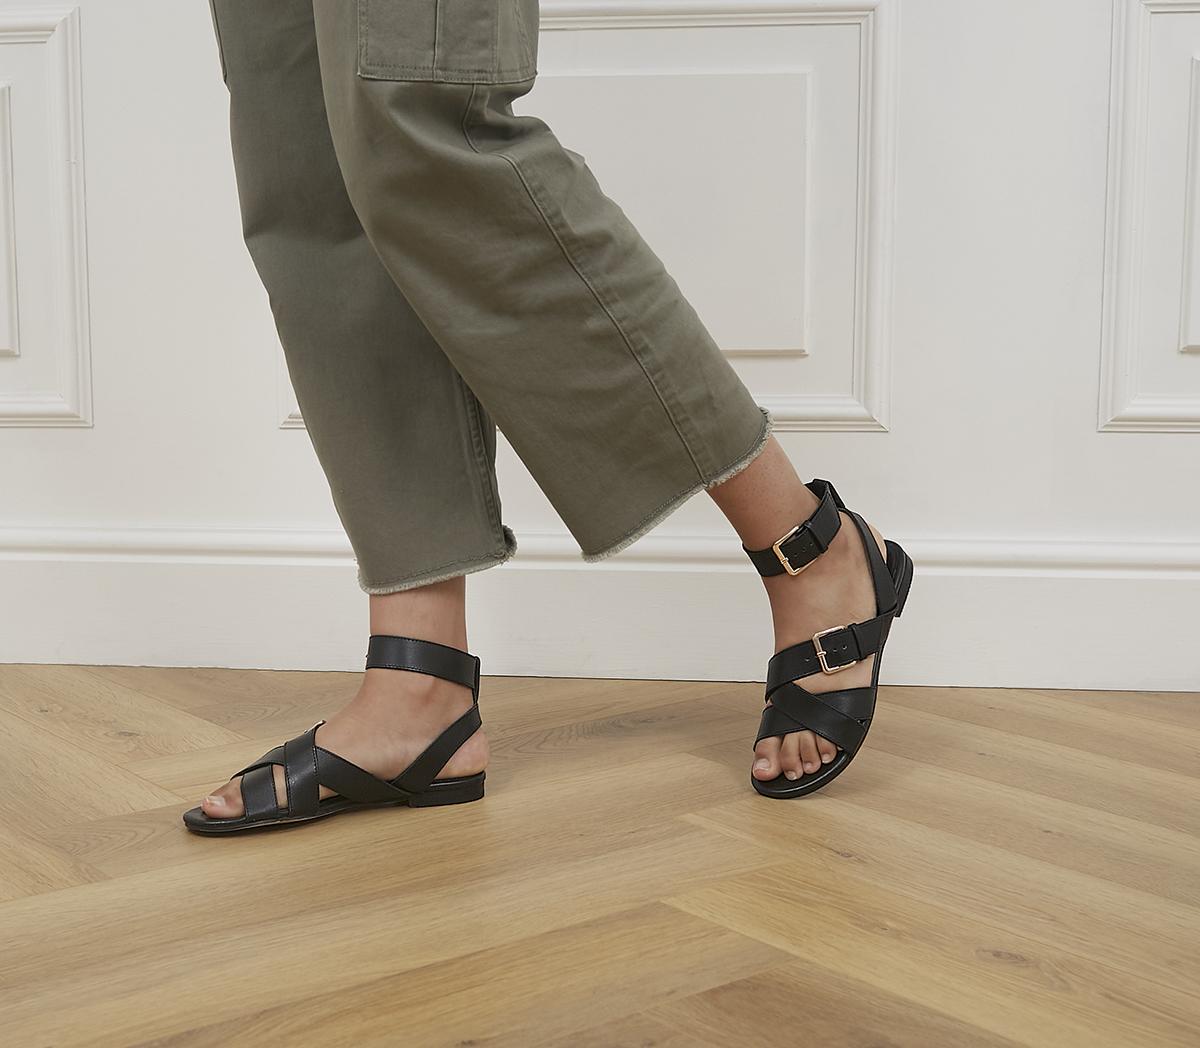 Superior Ankle Strap Sandals